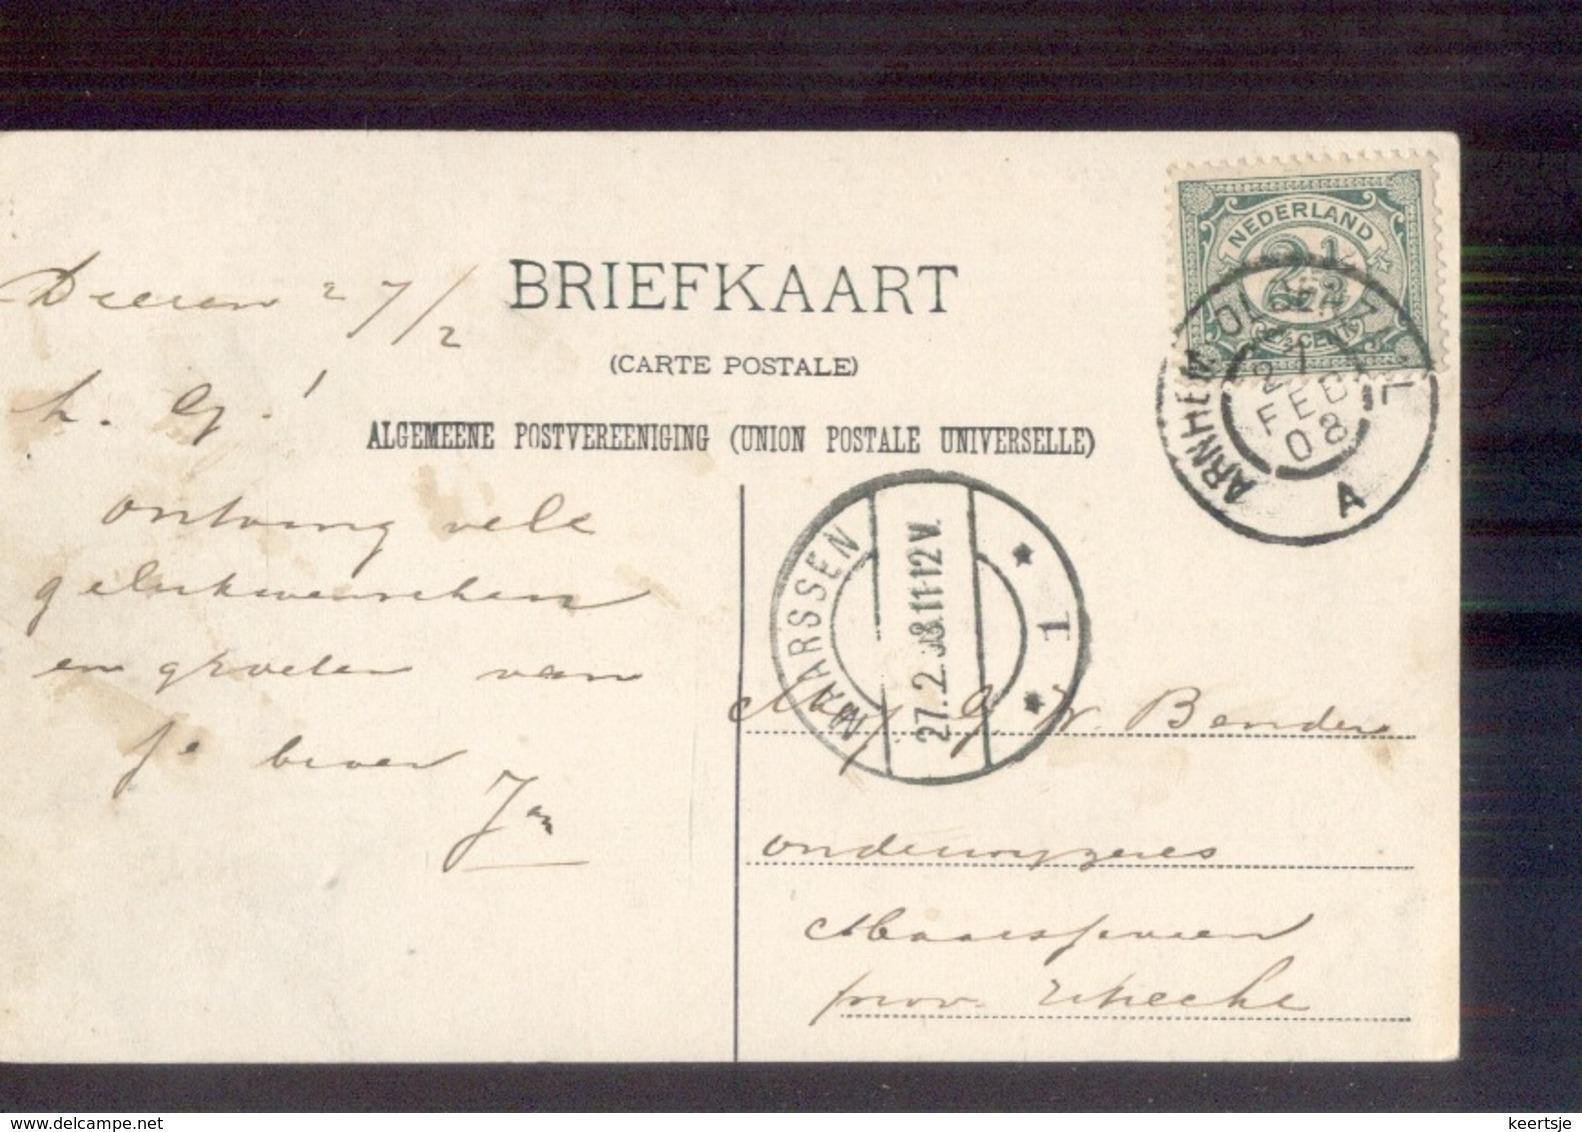 Arnhem Oldenzaal A Grootrond - Maarssen Langebalk 1 - 1908 - Poststempel